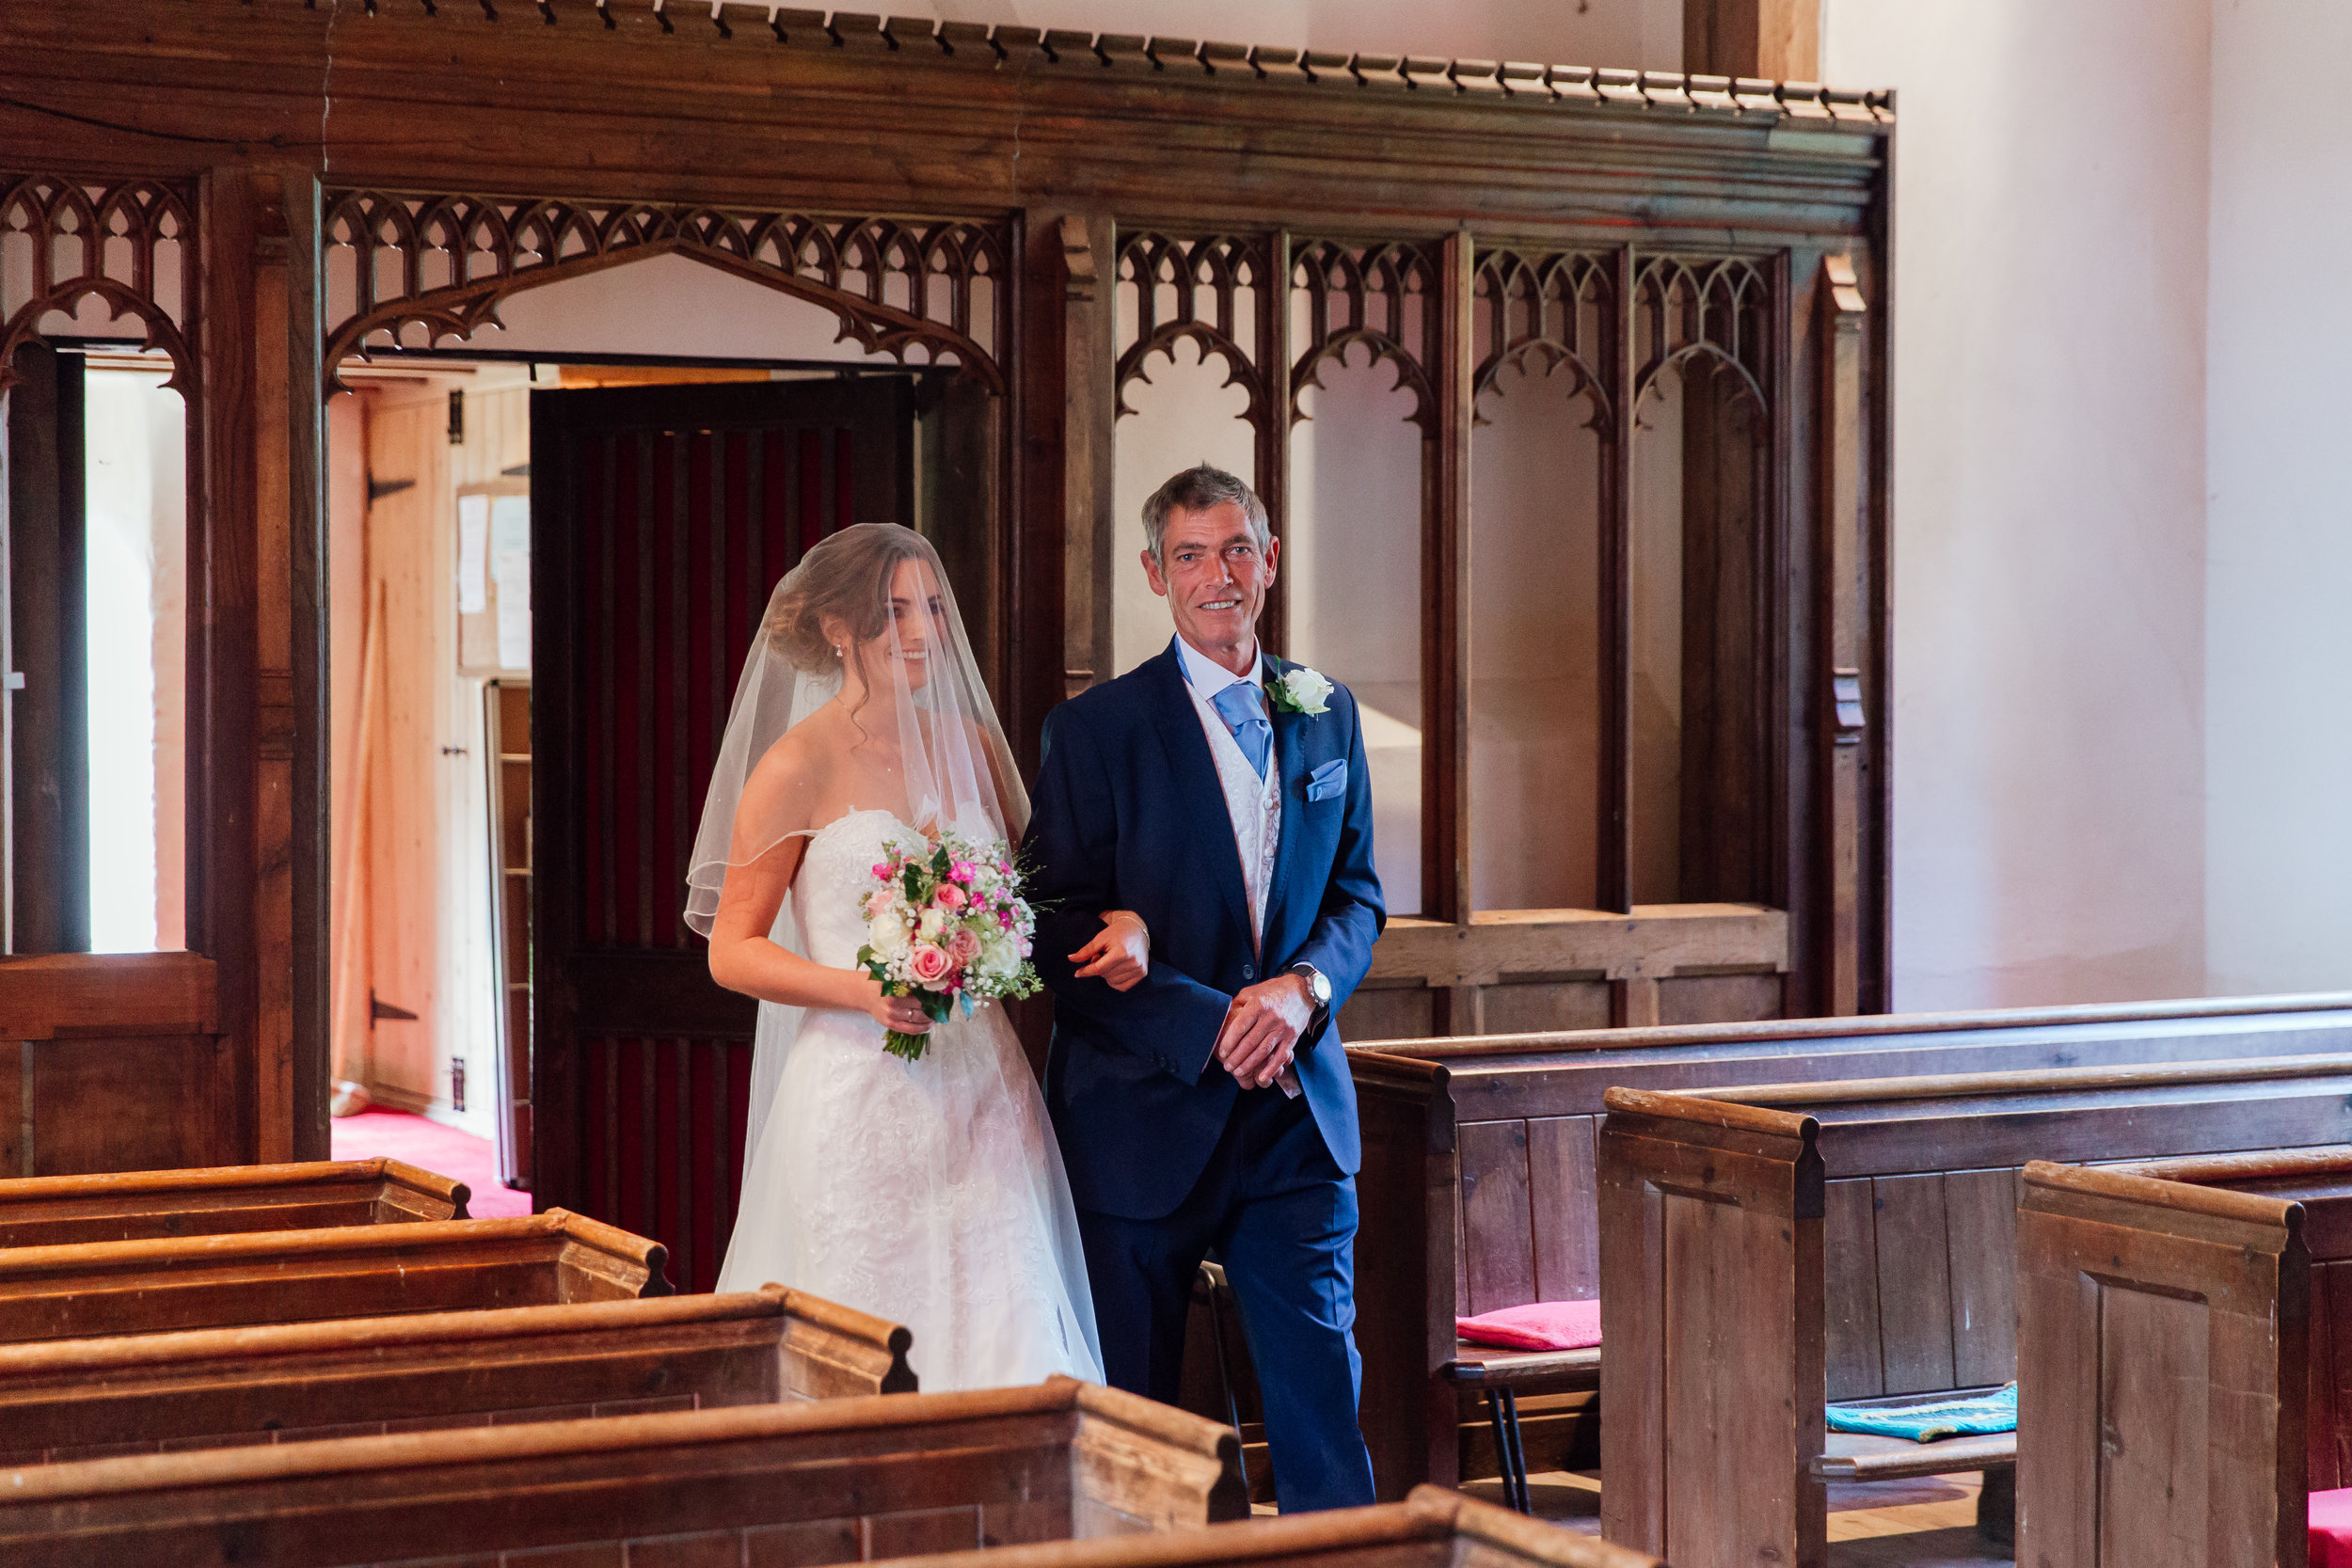 Rotherwick-villgae-hall-wedding-hampshire / Amy-james-photography / Wedding-photographer-hampshire /